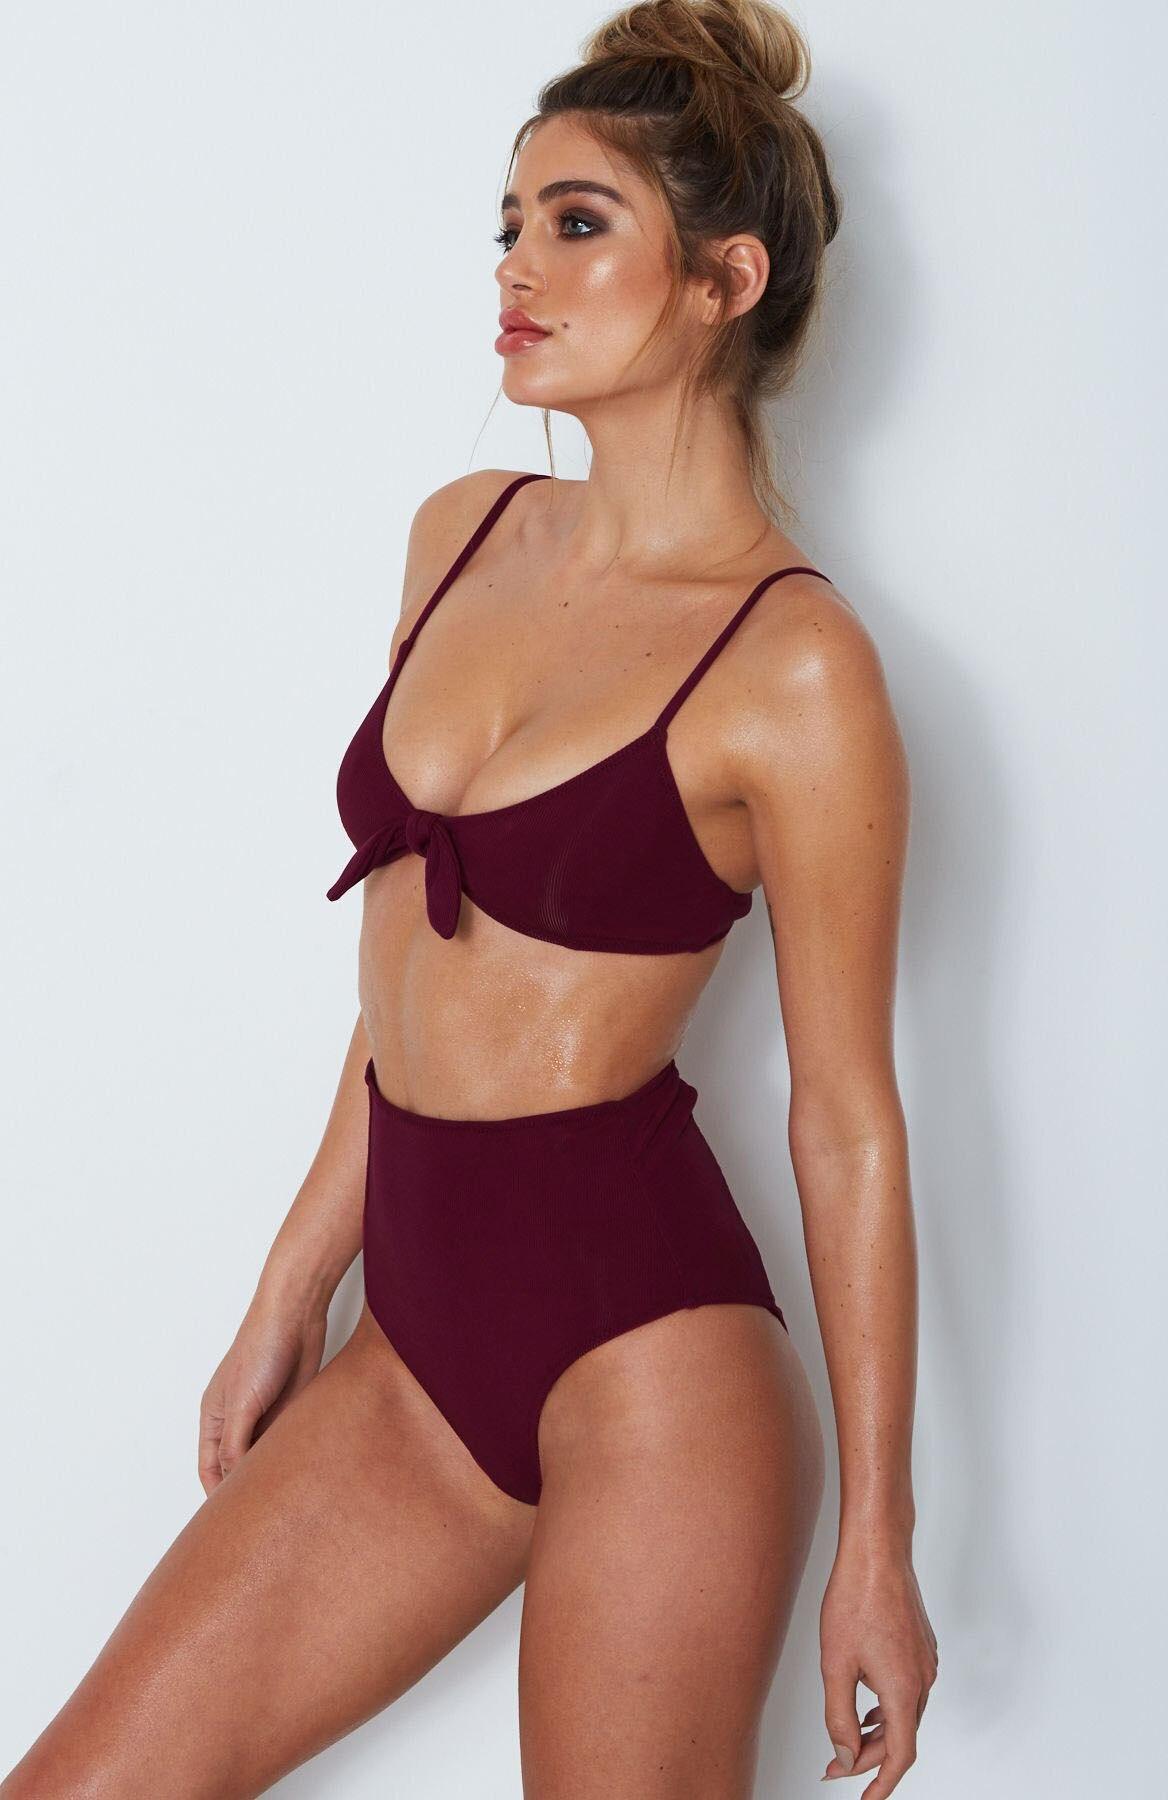 peep-shots-of-women-in-bikini